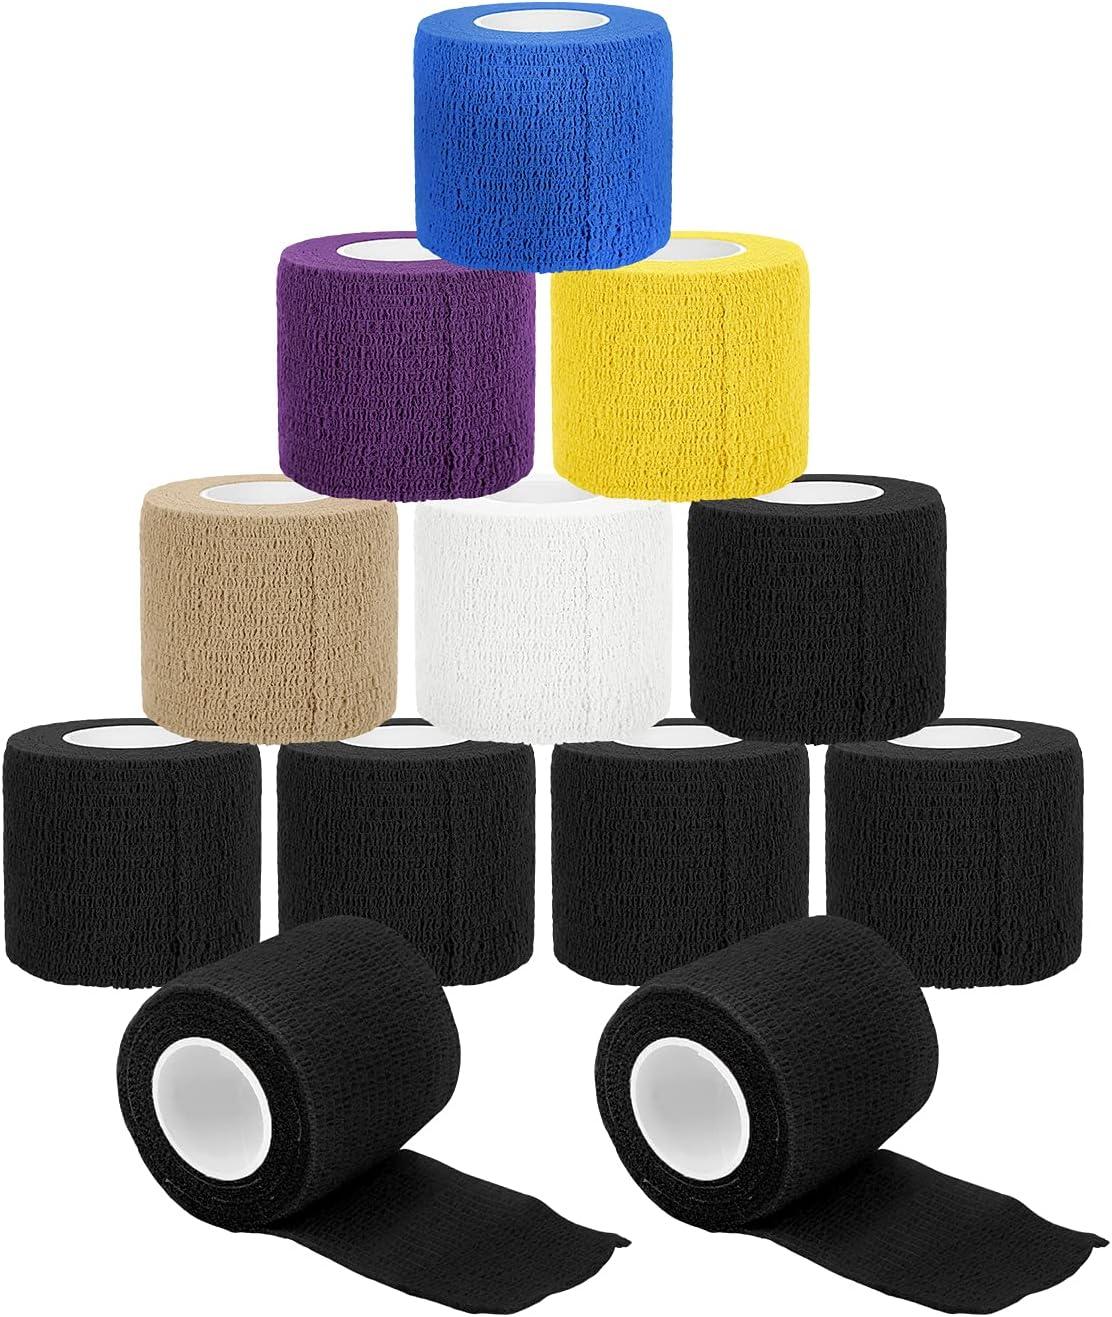 Self Adhesive Detroit Mall Direct sale of manufacturer Bandage Wrap Jaywayne Tattoo Vet 12PCS Tape Grip W